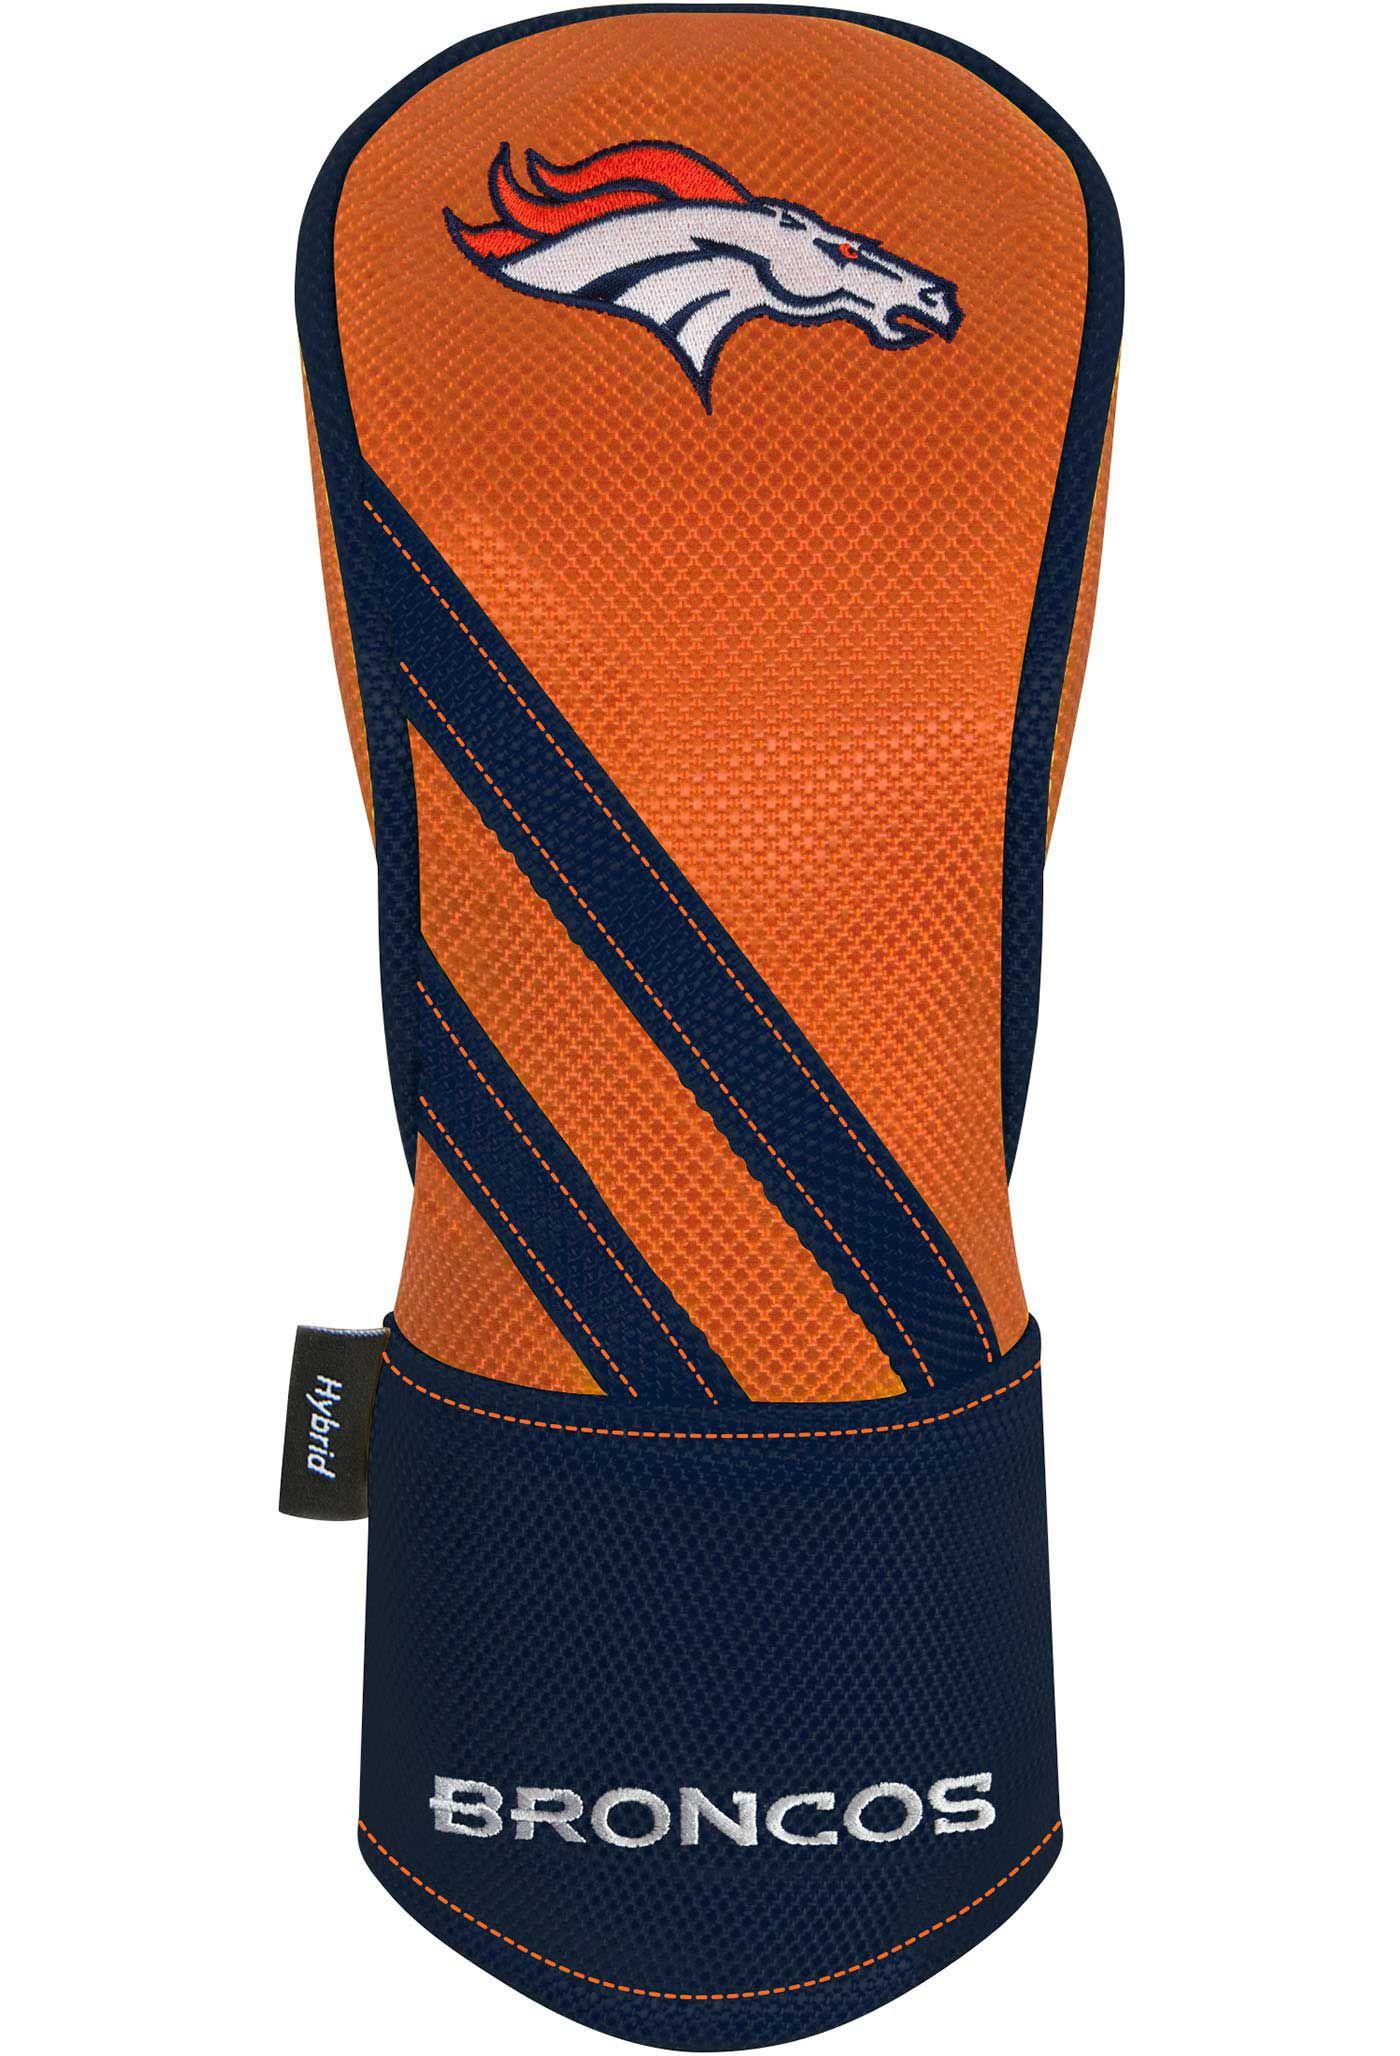 Team Effort Denver Broncos Hybrid Headcover